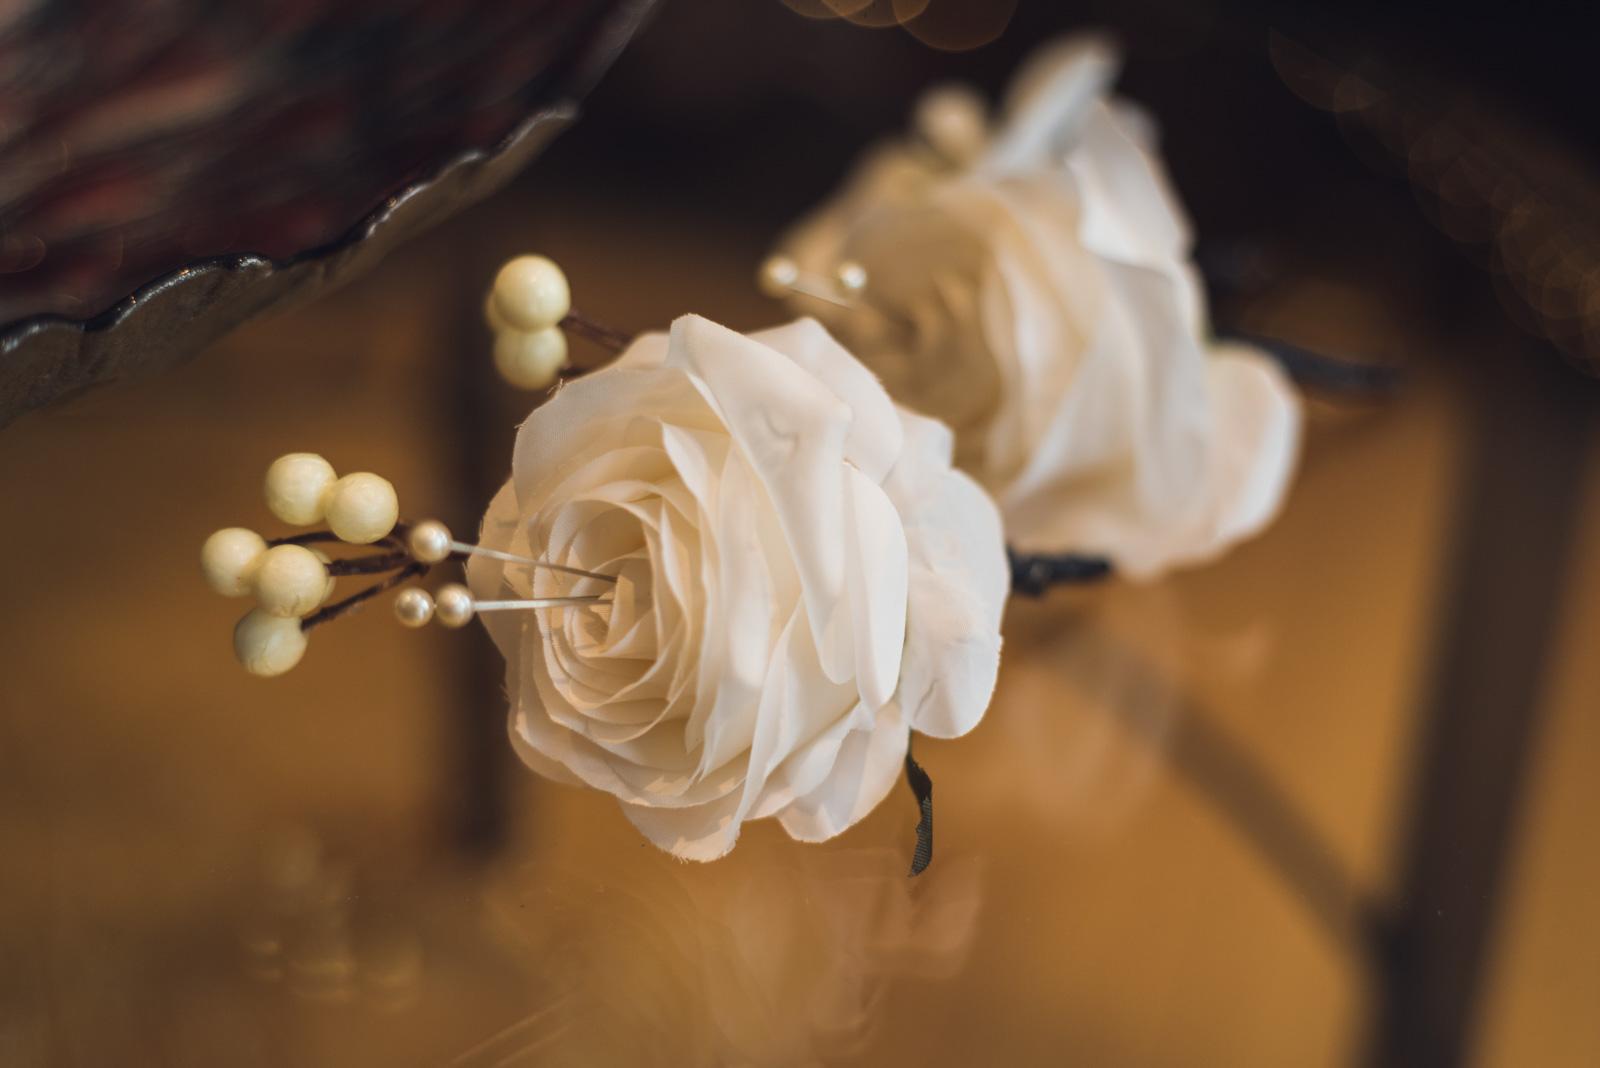 rheana-chris-wedding-blog-29.jpg